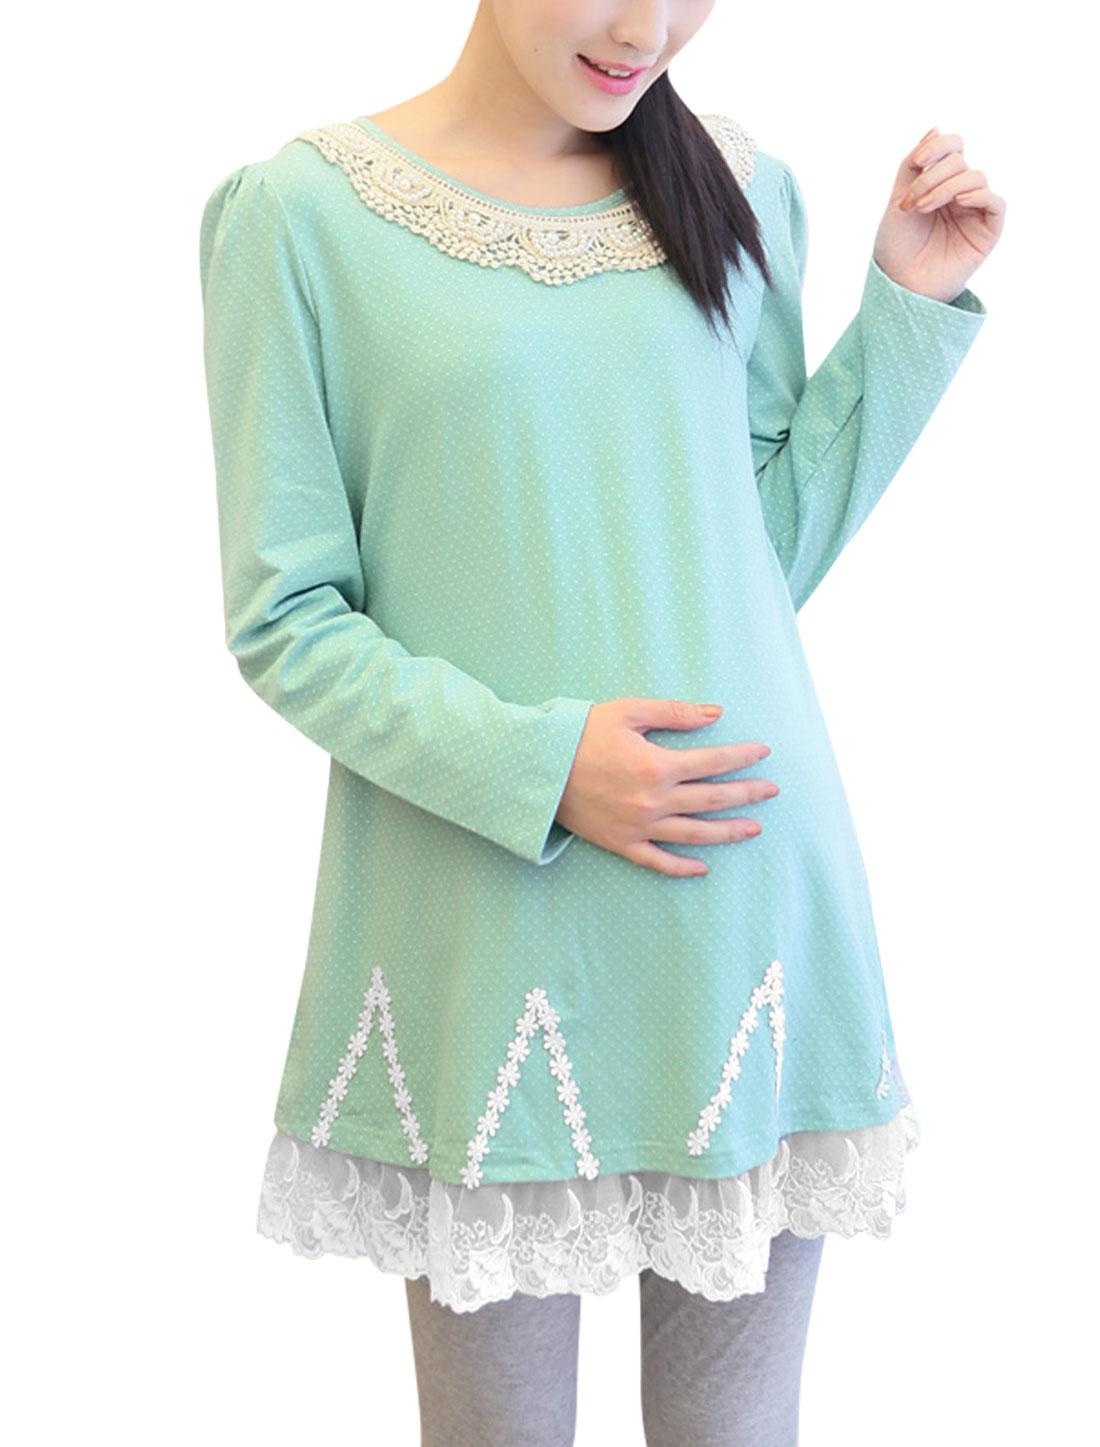 Maternity Crochet Decor Dots Pattern Lace Hem Soft Top Mint M